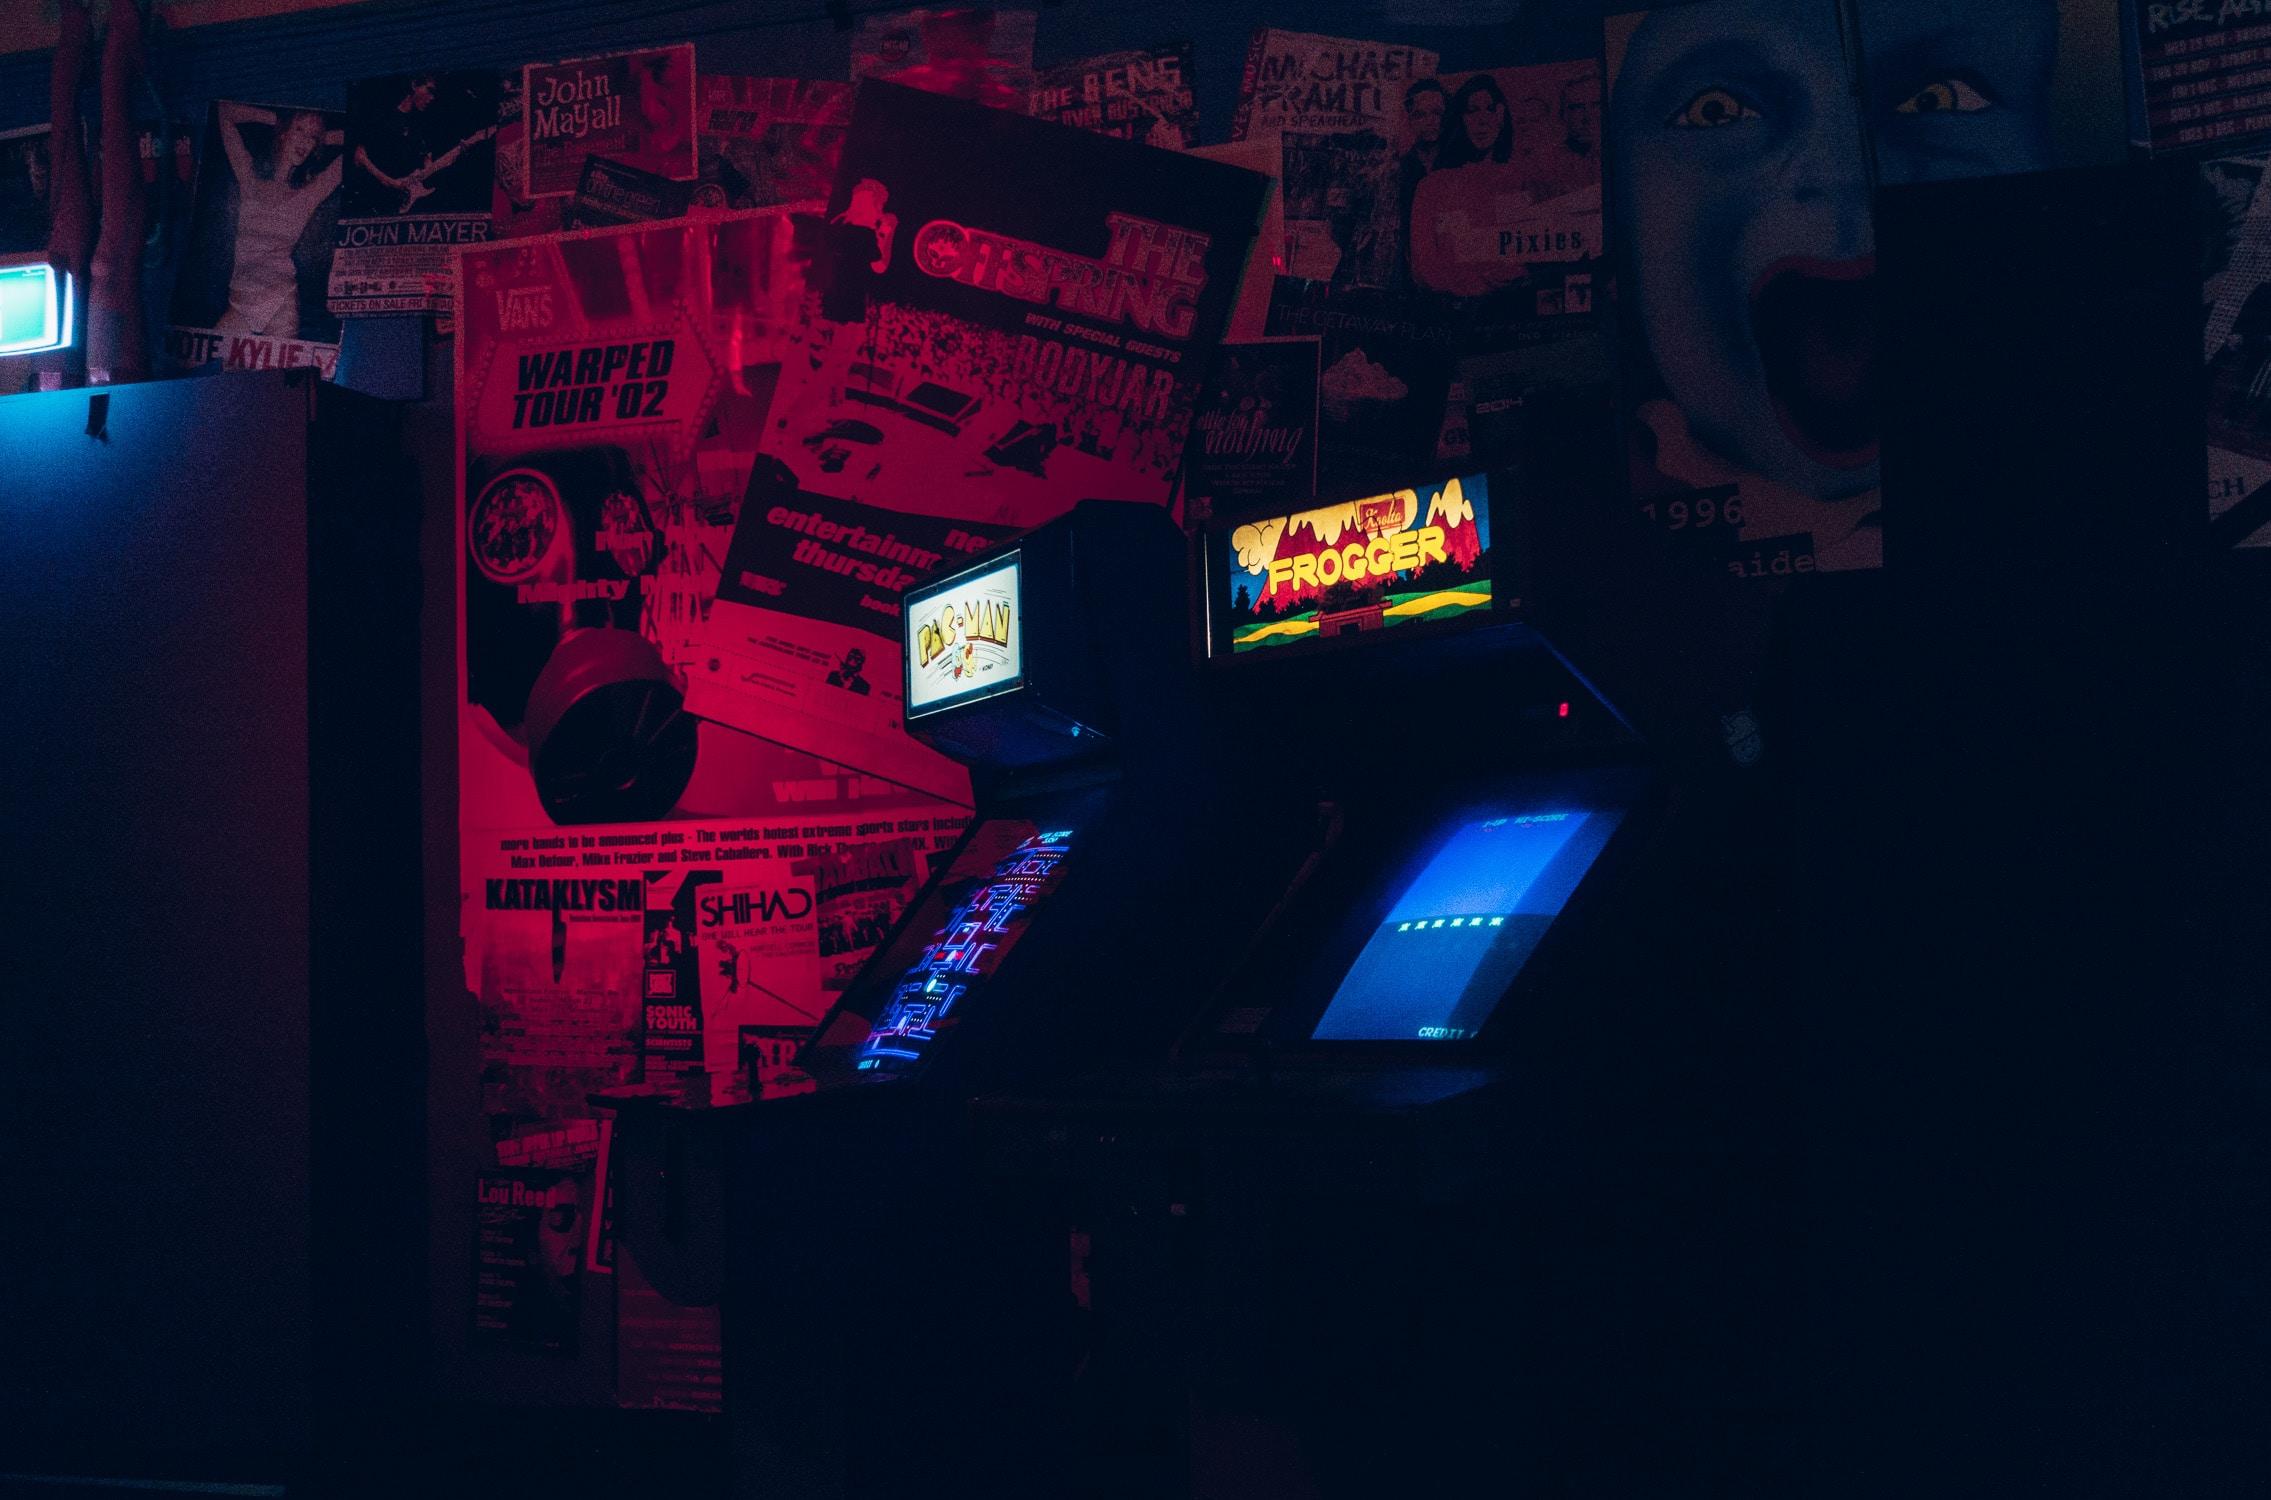 Arcade Owner son stories